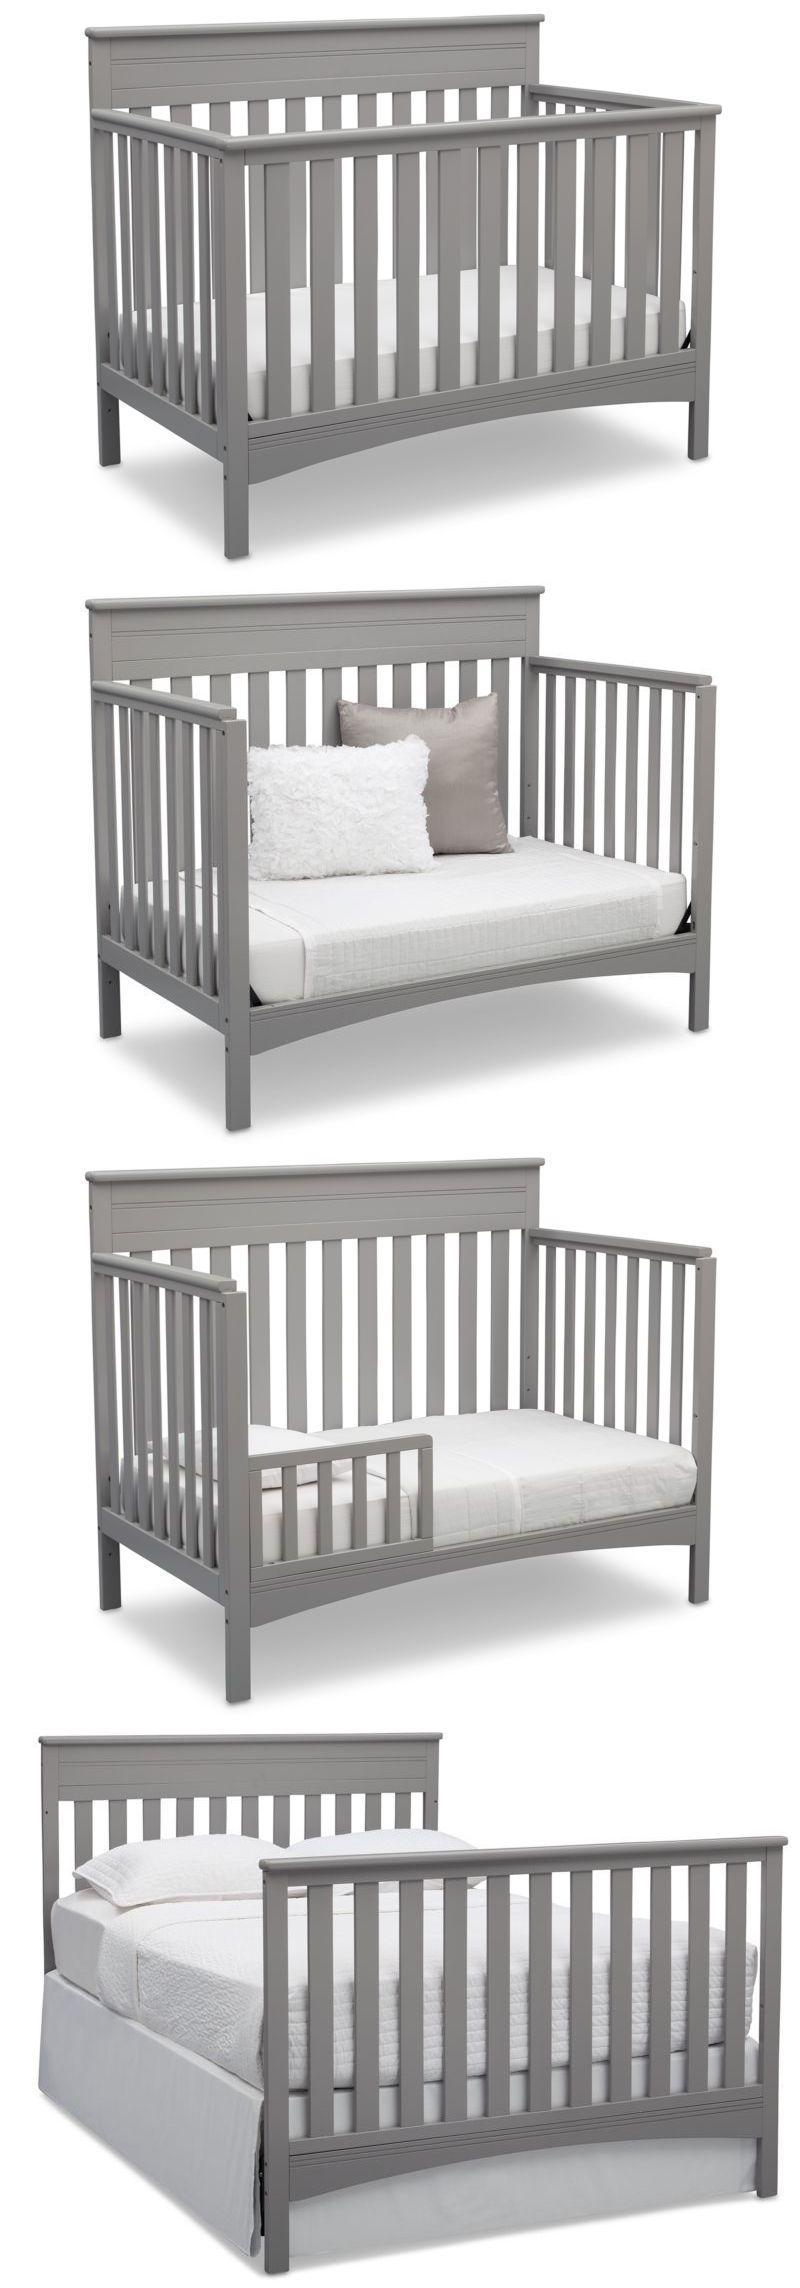 nursery furniture 20422 crib mattress protector baby crib mattress